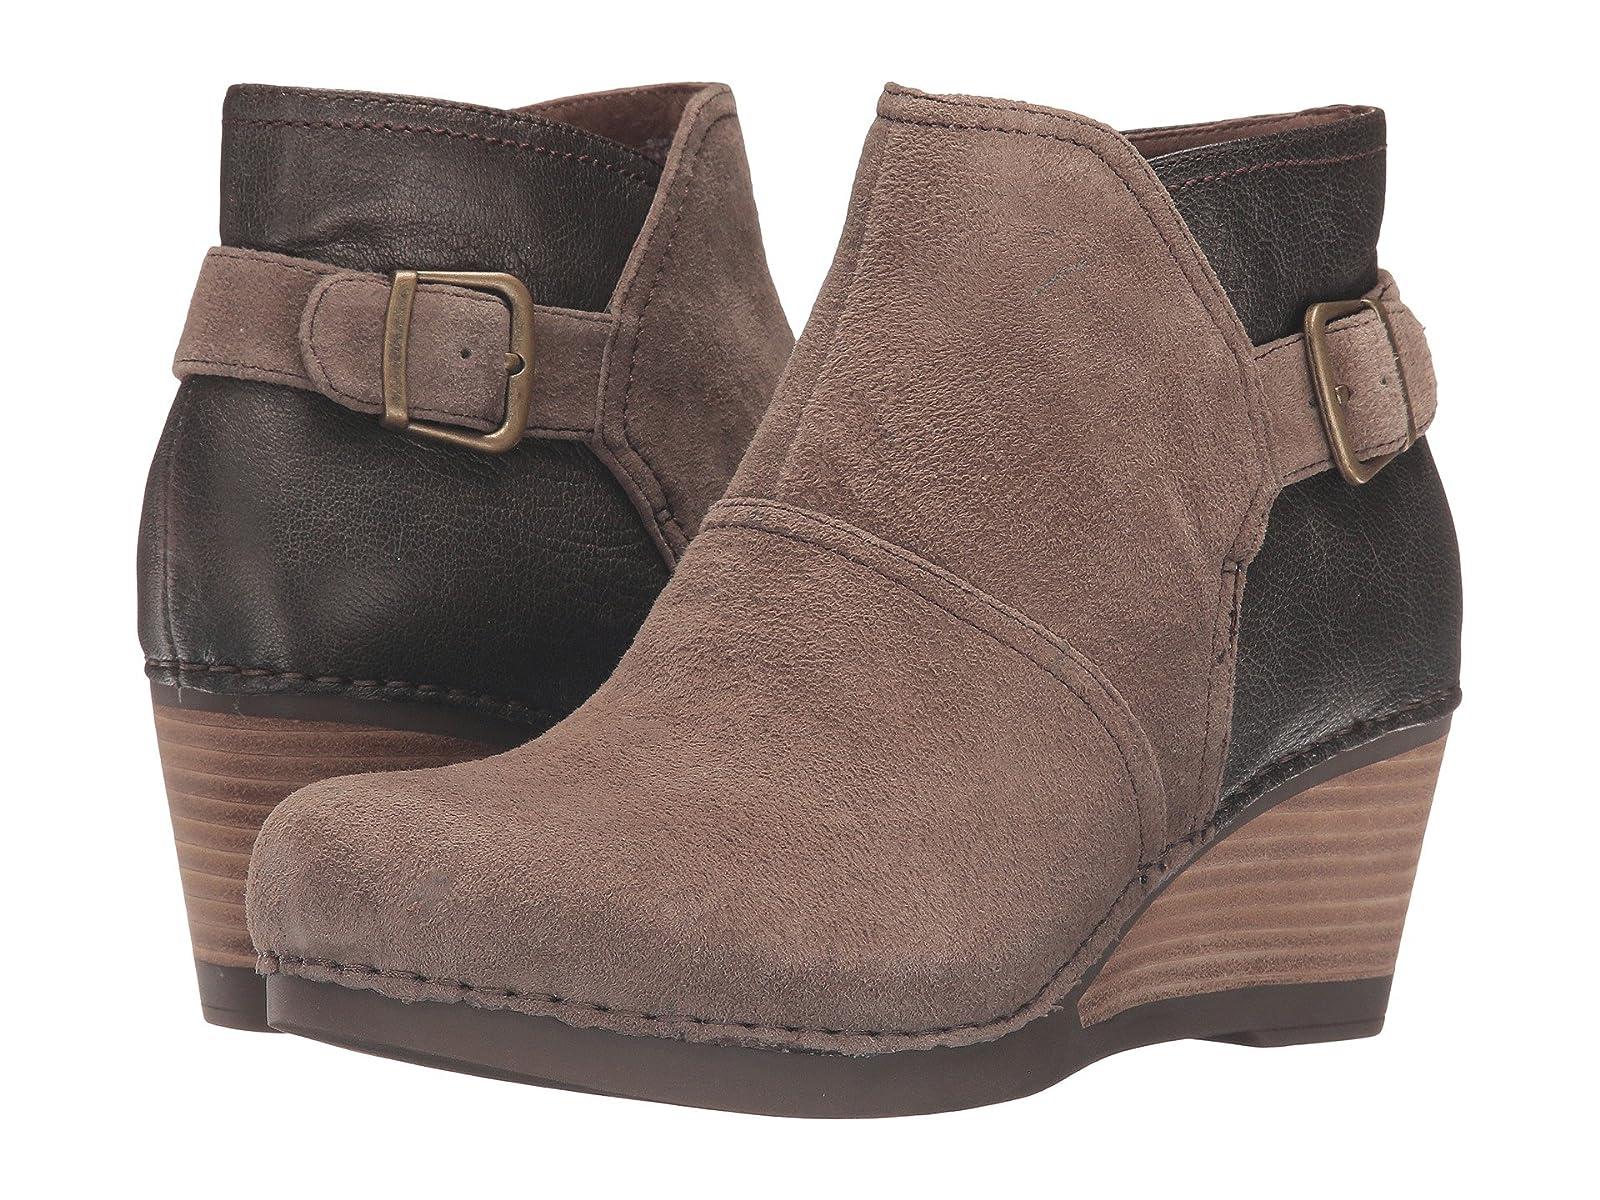 Dansko ShirleyAffordable and distinctive shoes